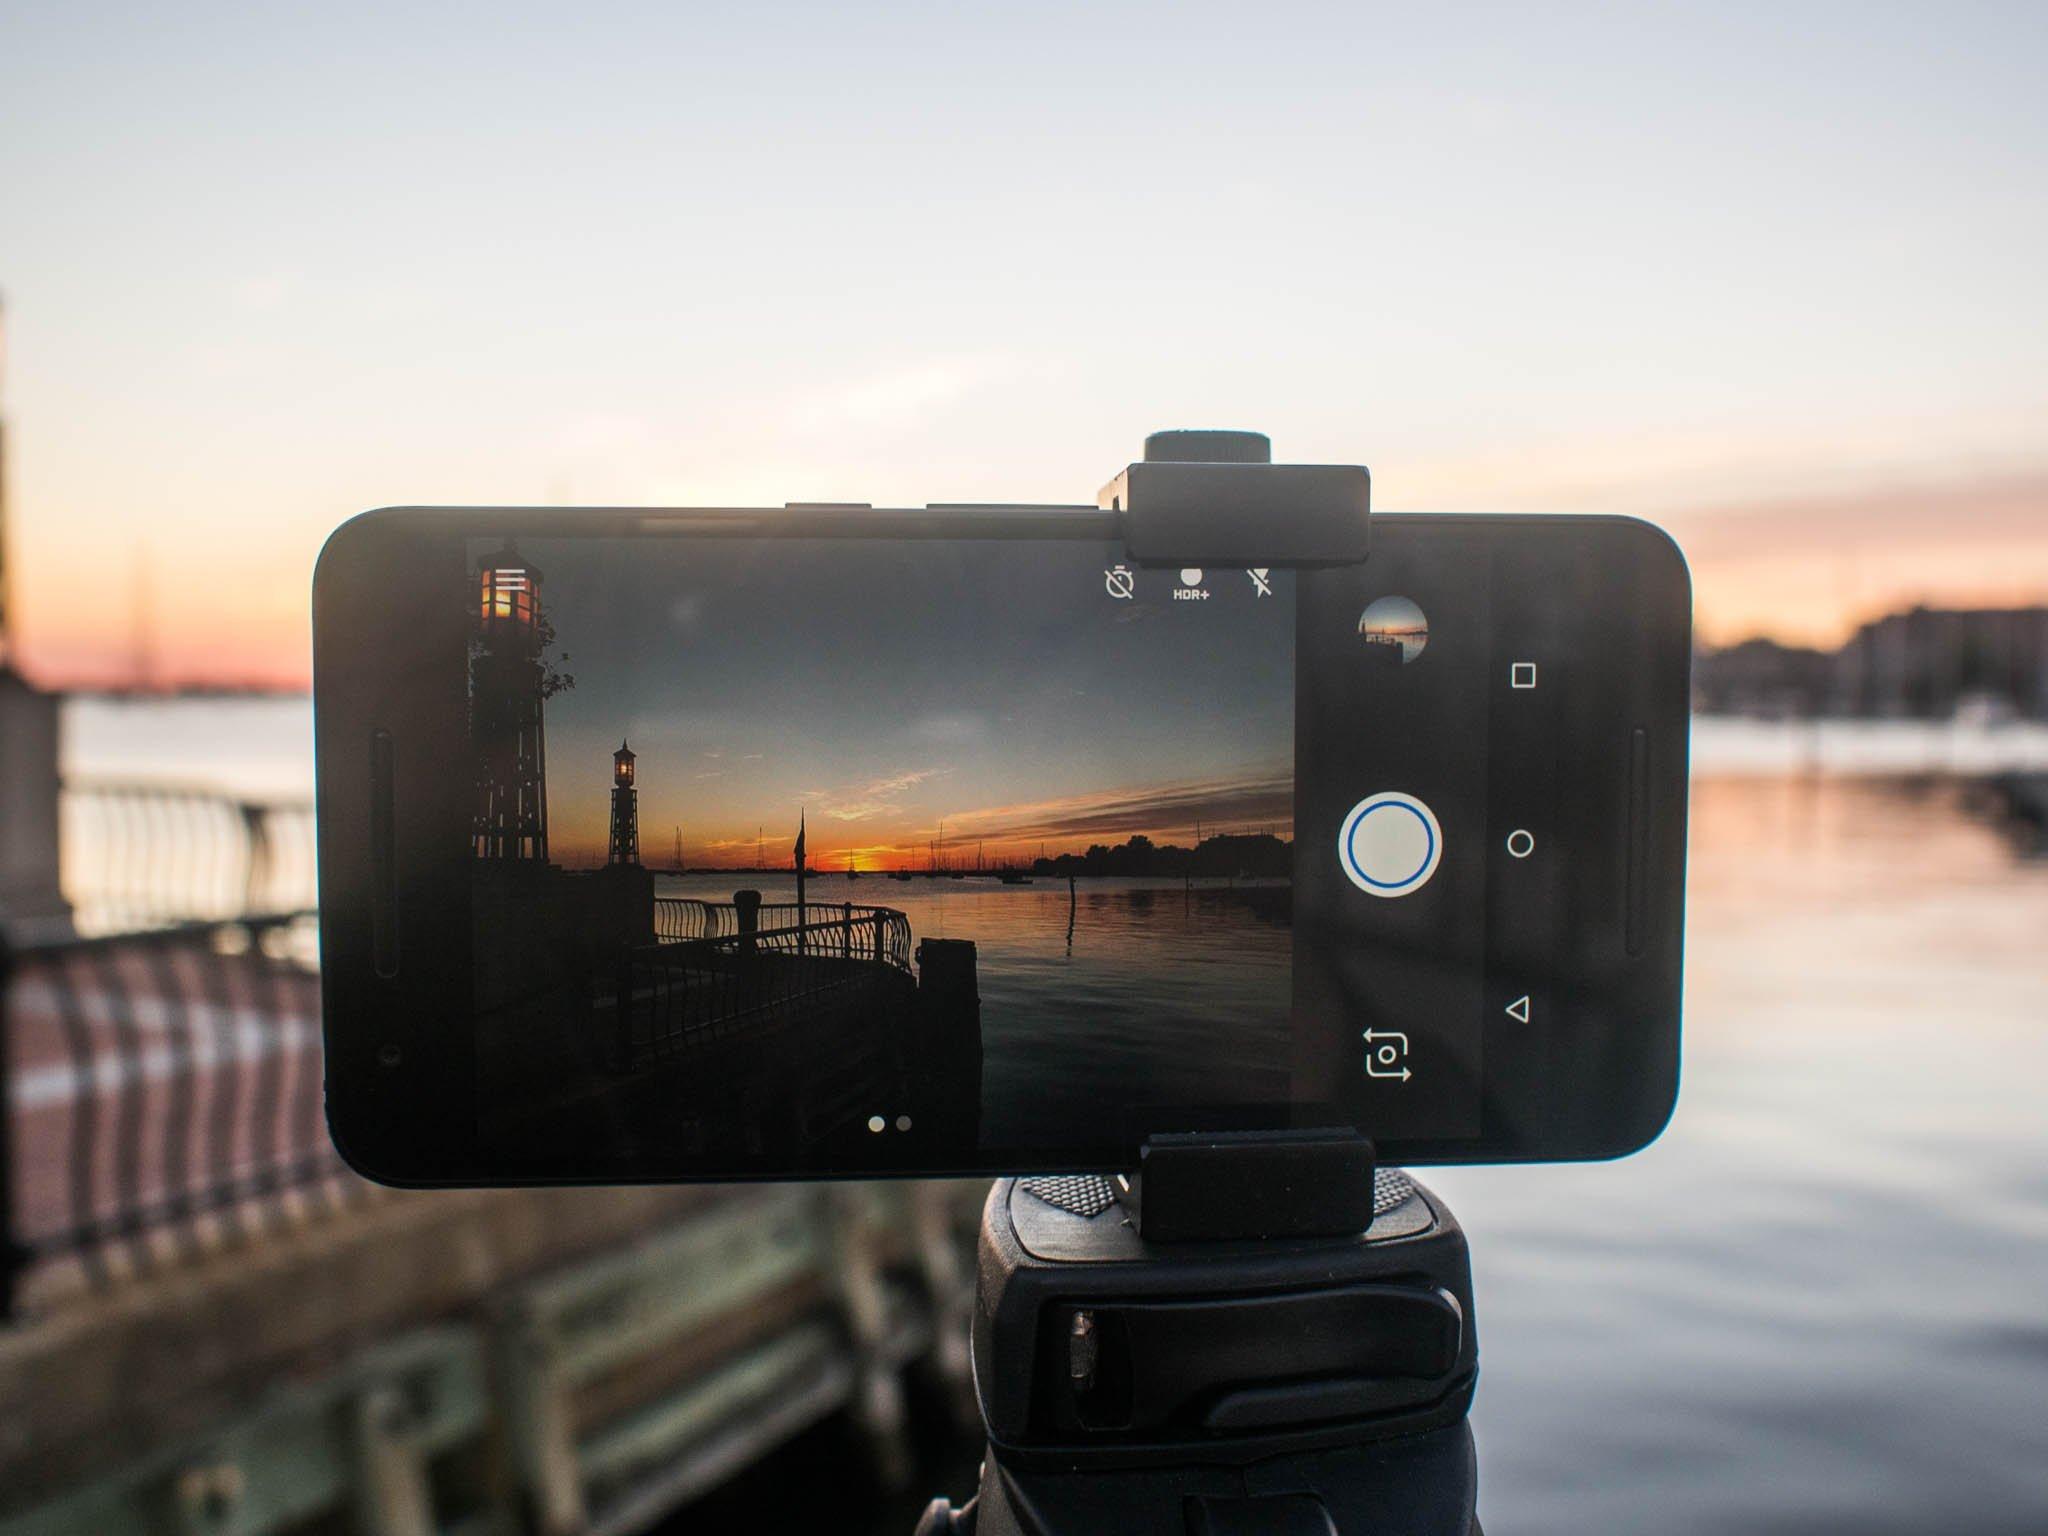 Phantasy Nexus Camera Camera Shots From Nexus Android Central Nexus 6p Camera Review 2016 Nexus 6p Front Camera Review dpreview Nexus 6p Camera Review